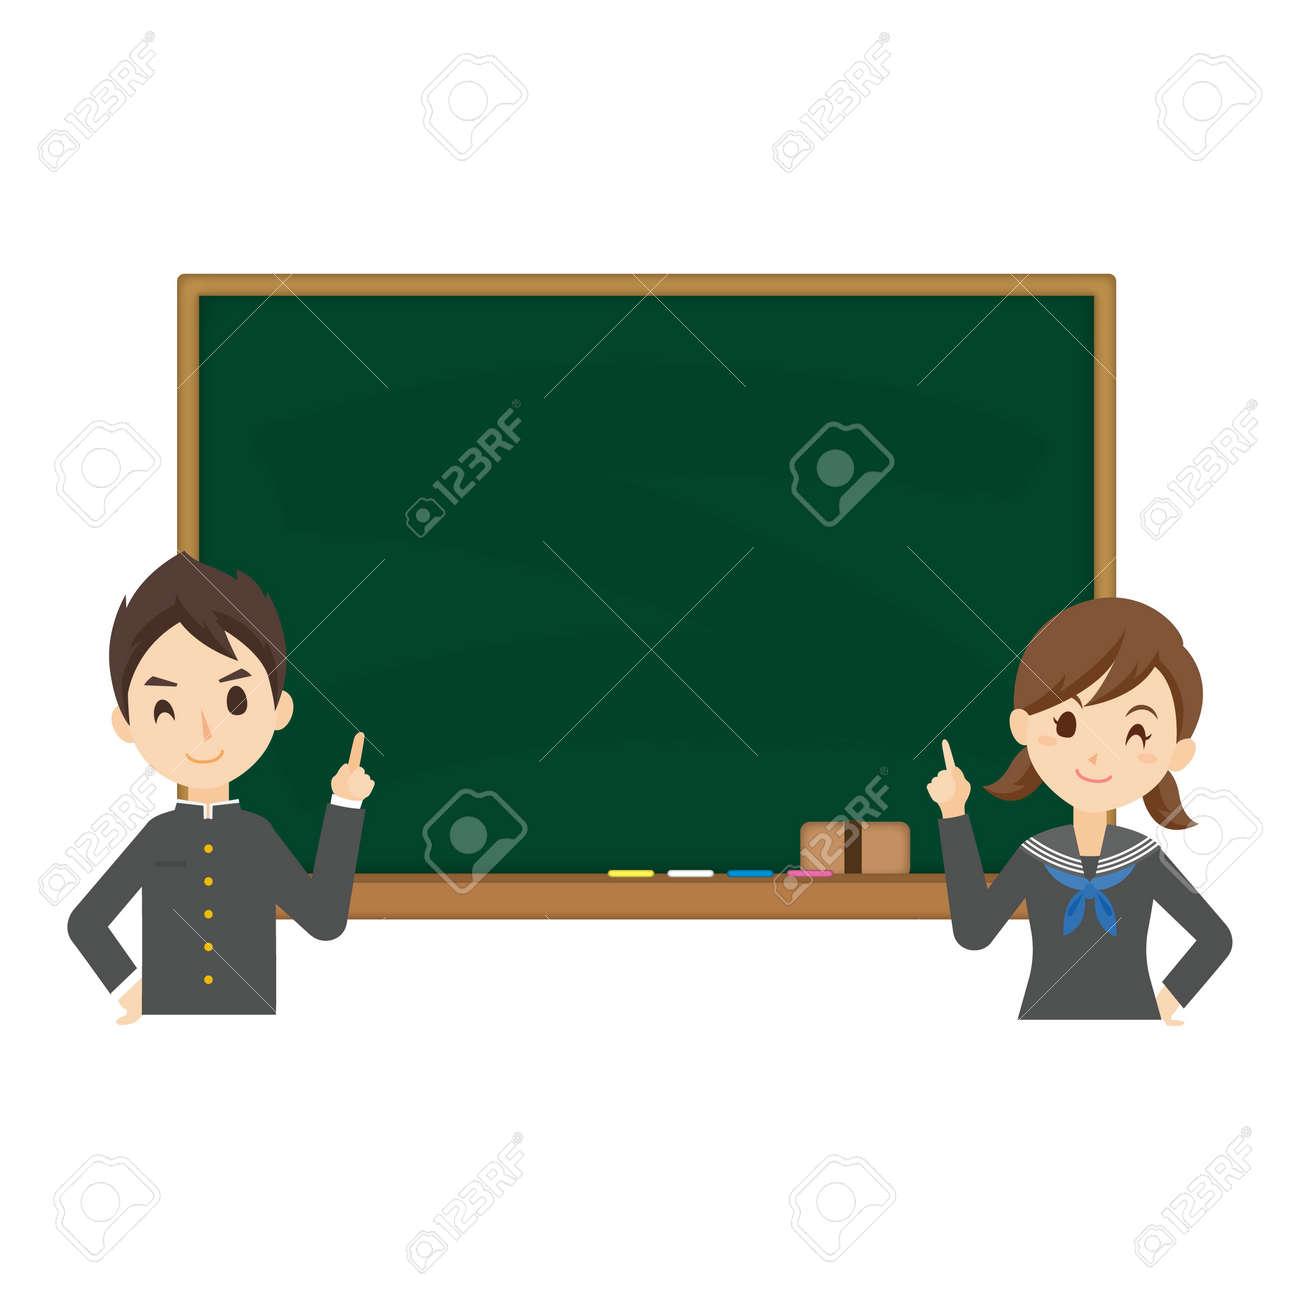 Student Blackboard Background - 168556973